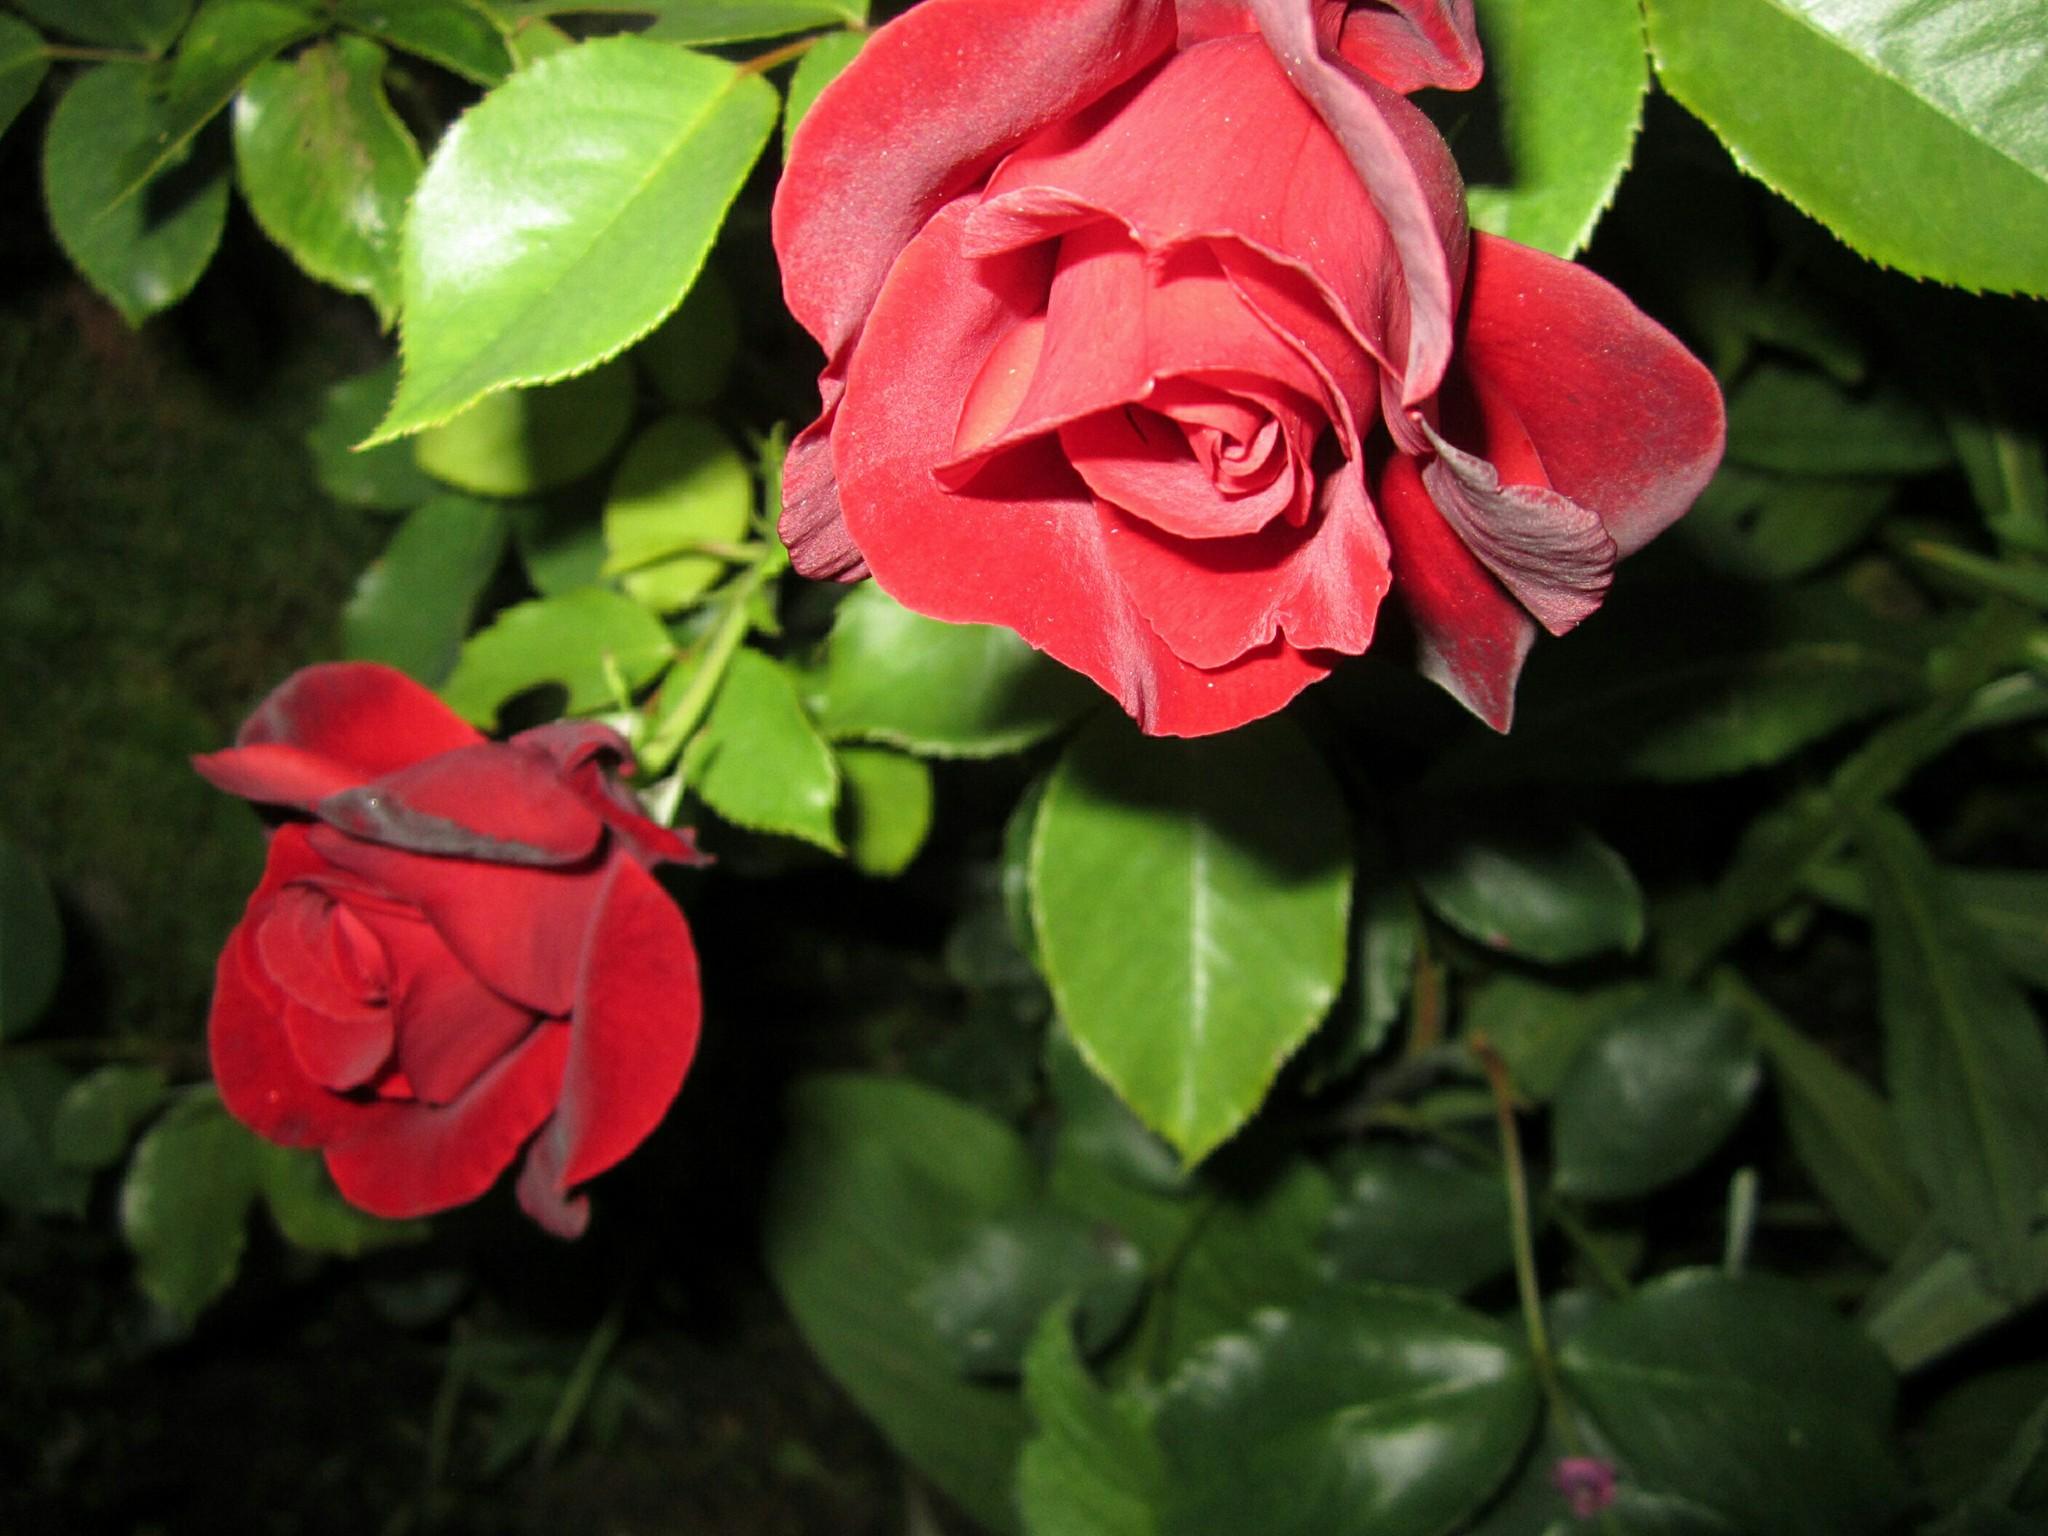 Картинки для аватар цветы